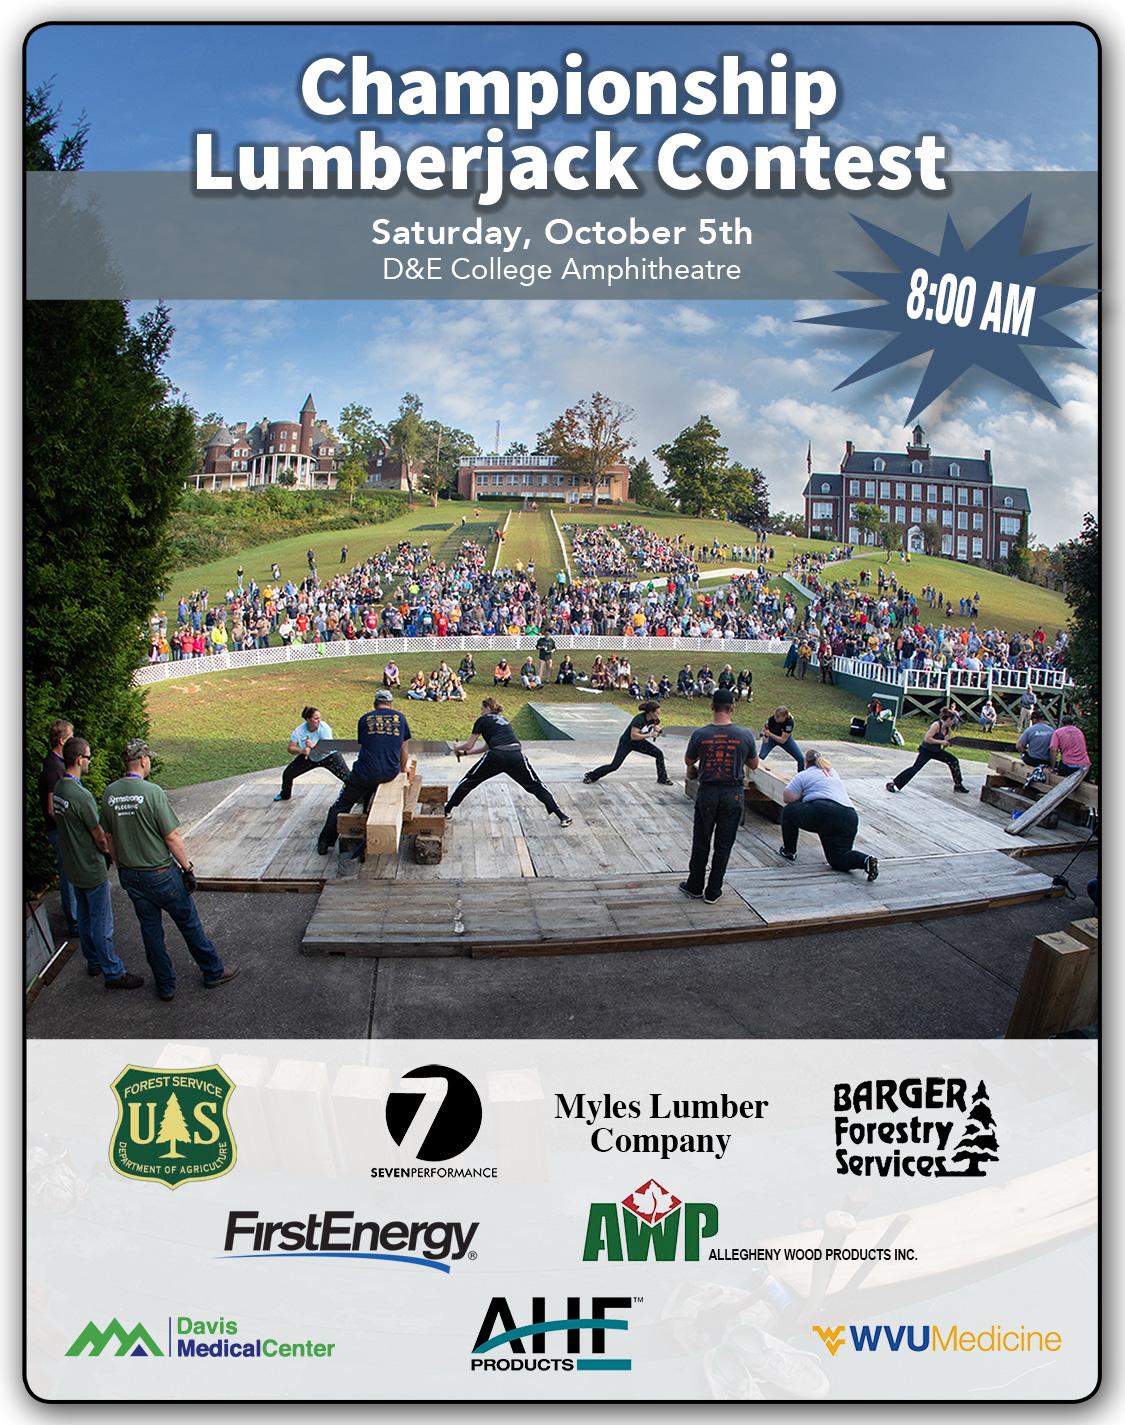 Lumberjack Contest